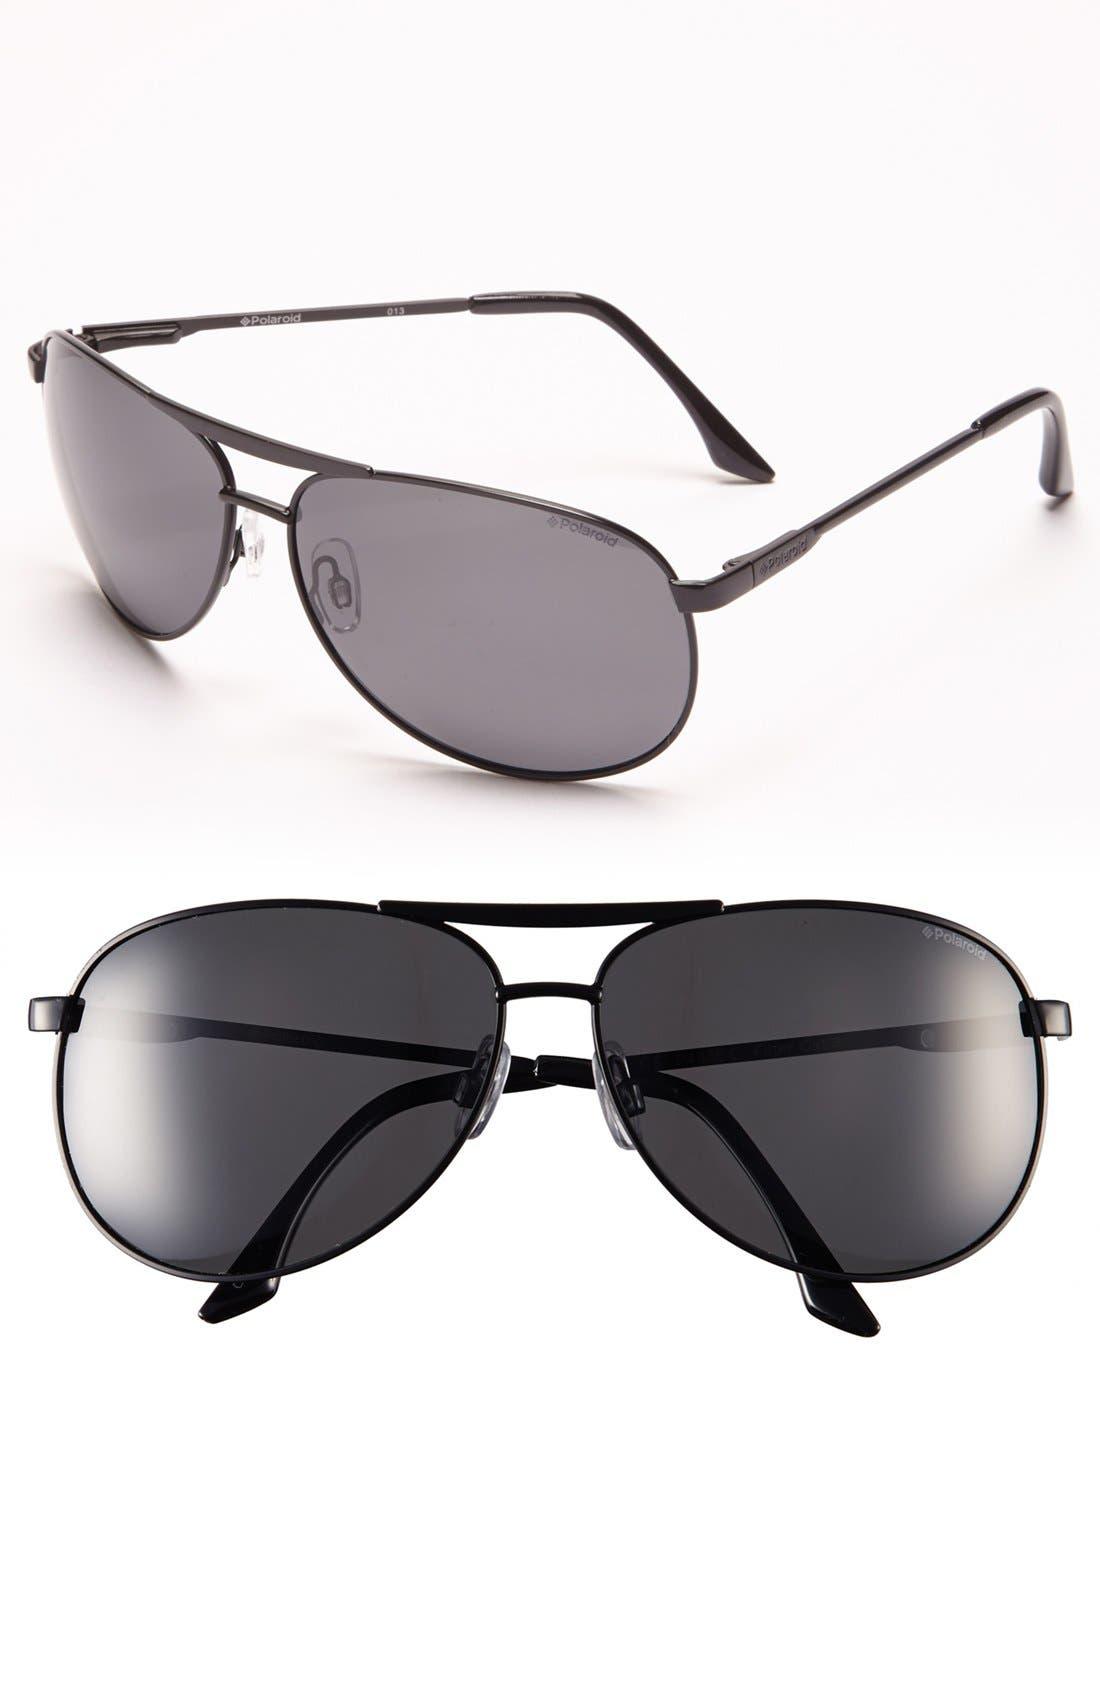 Main Image - Polaroid Eyewear 68mm Polarized Metal Aviator Sunglasses